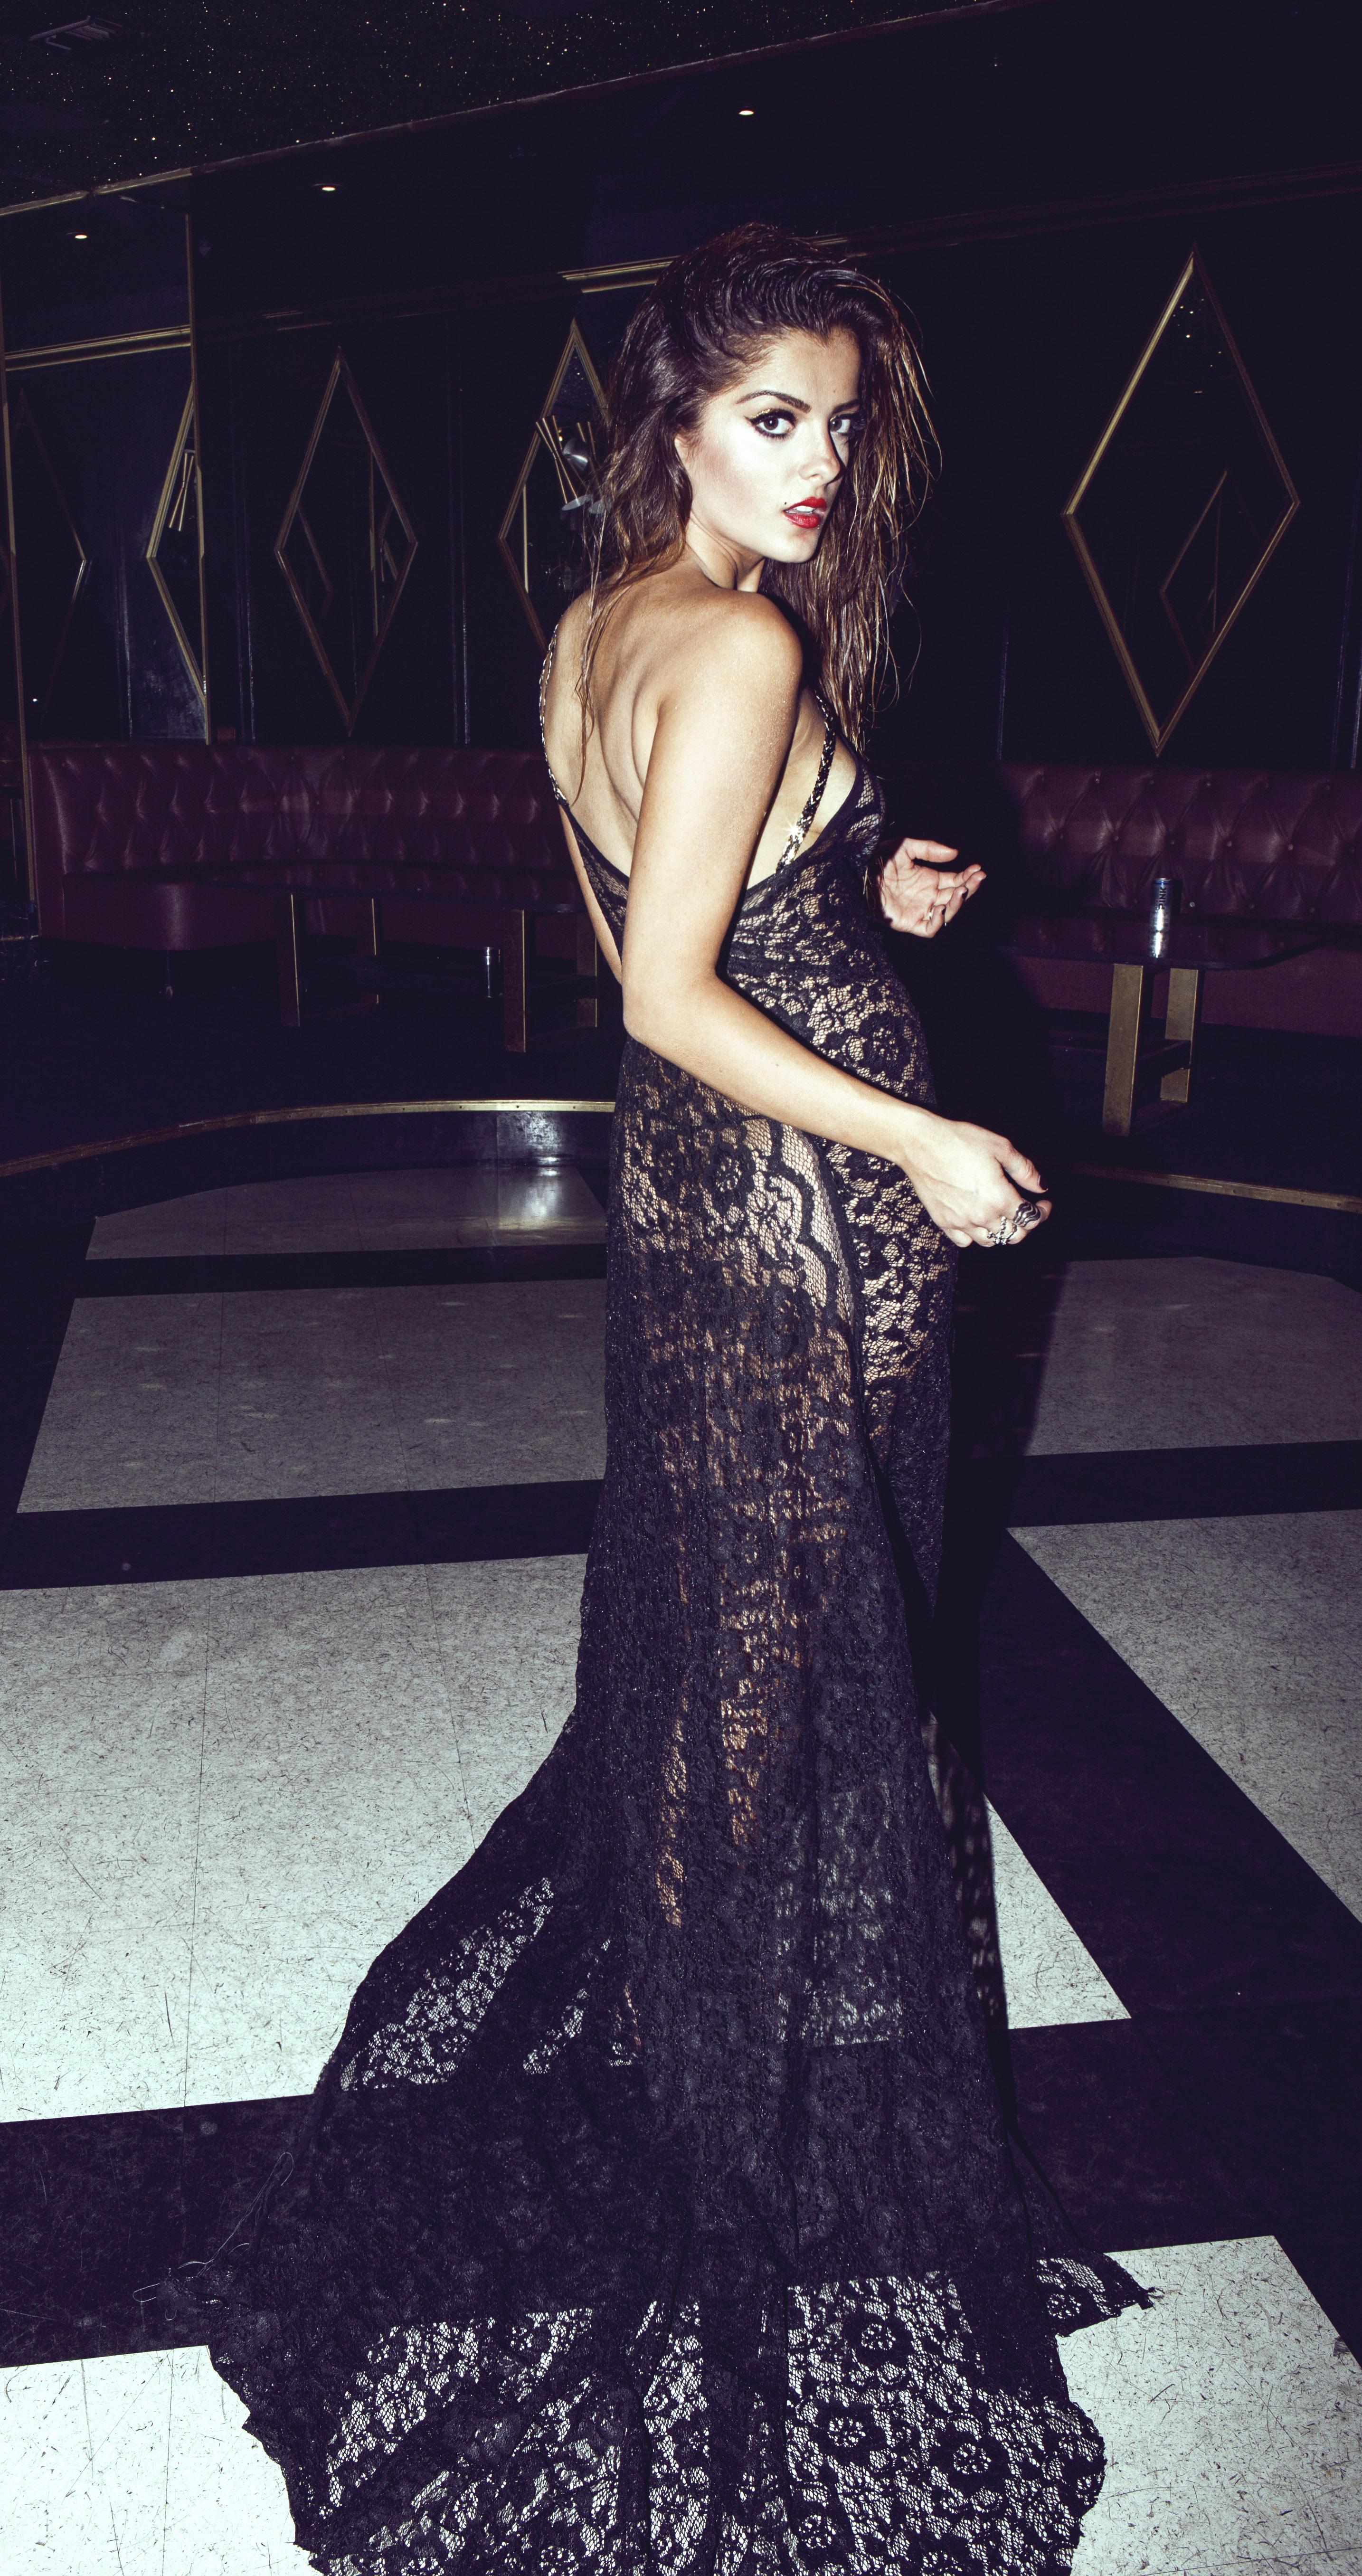 File:Bebe Rexha Pub Shot.jpg - Wikimedia Commons